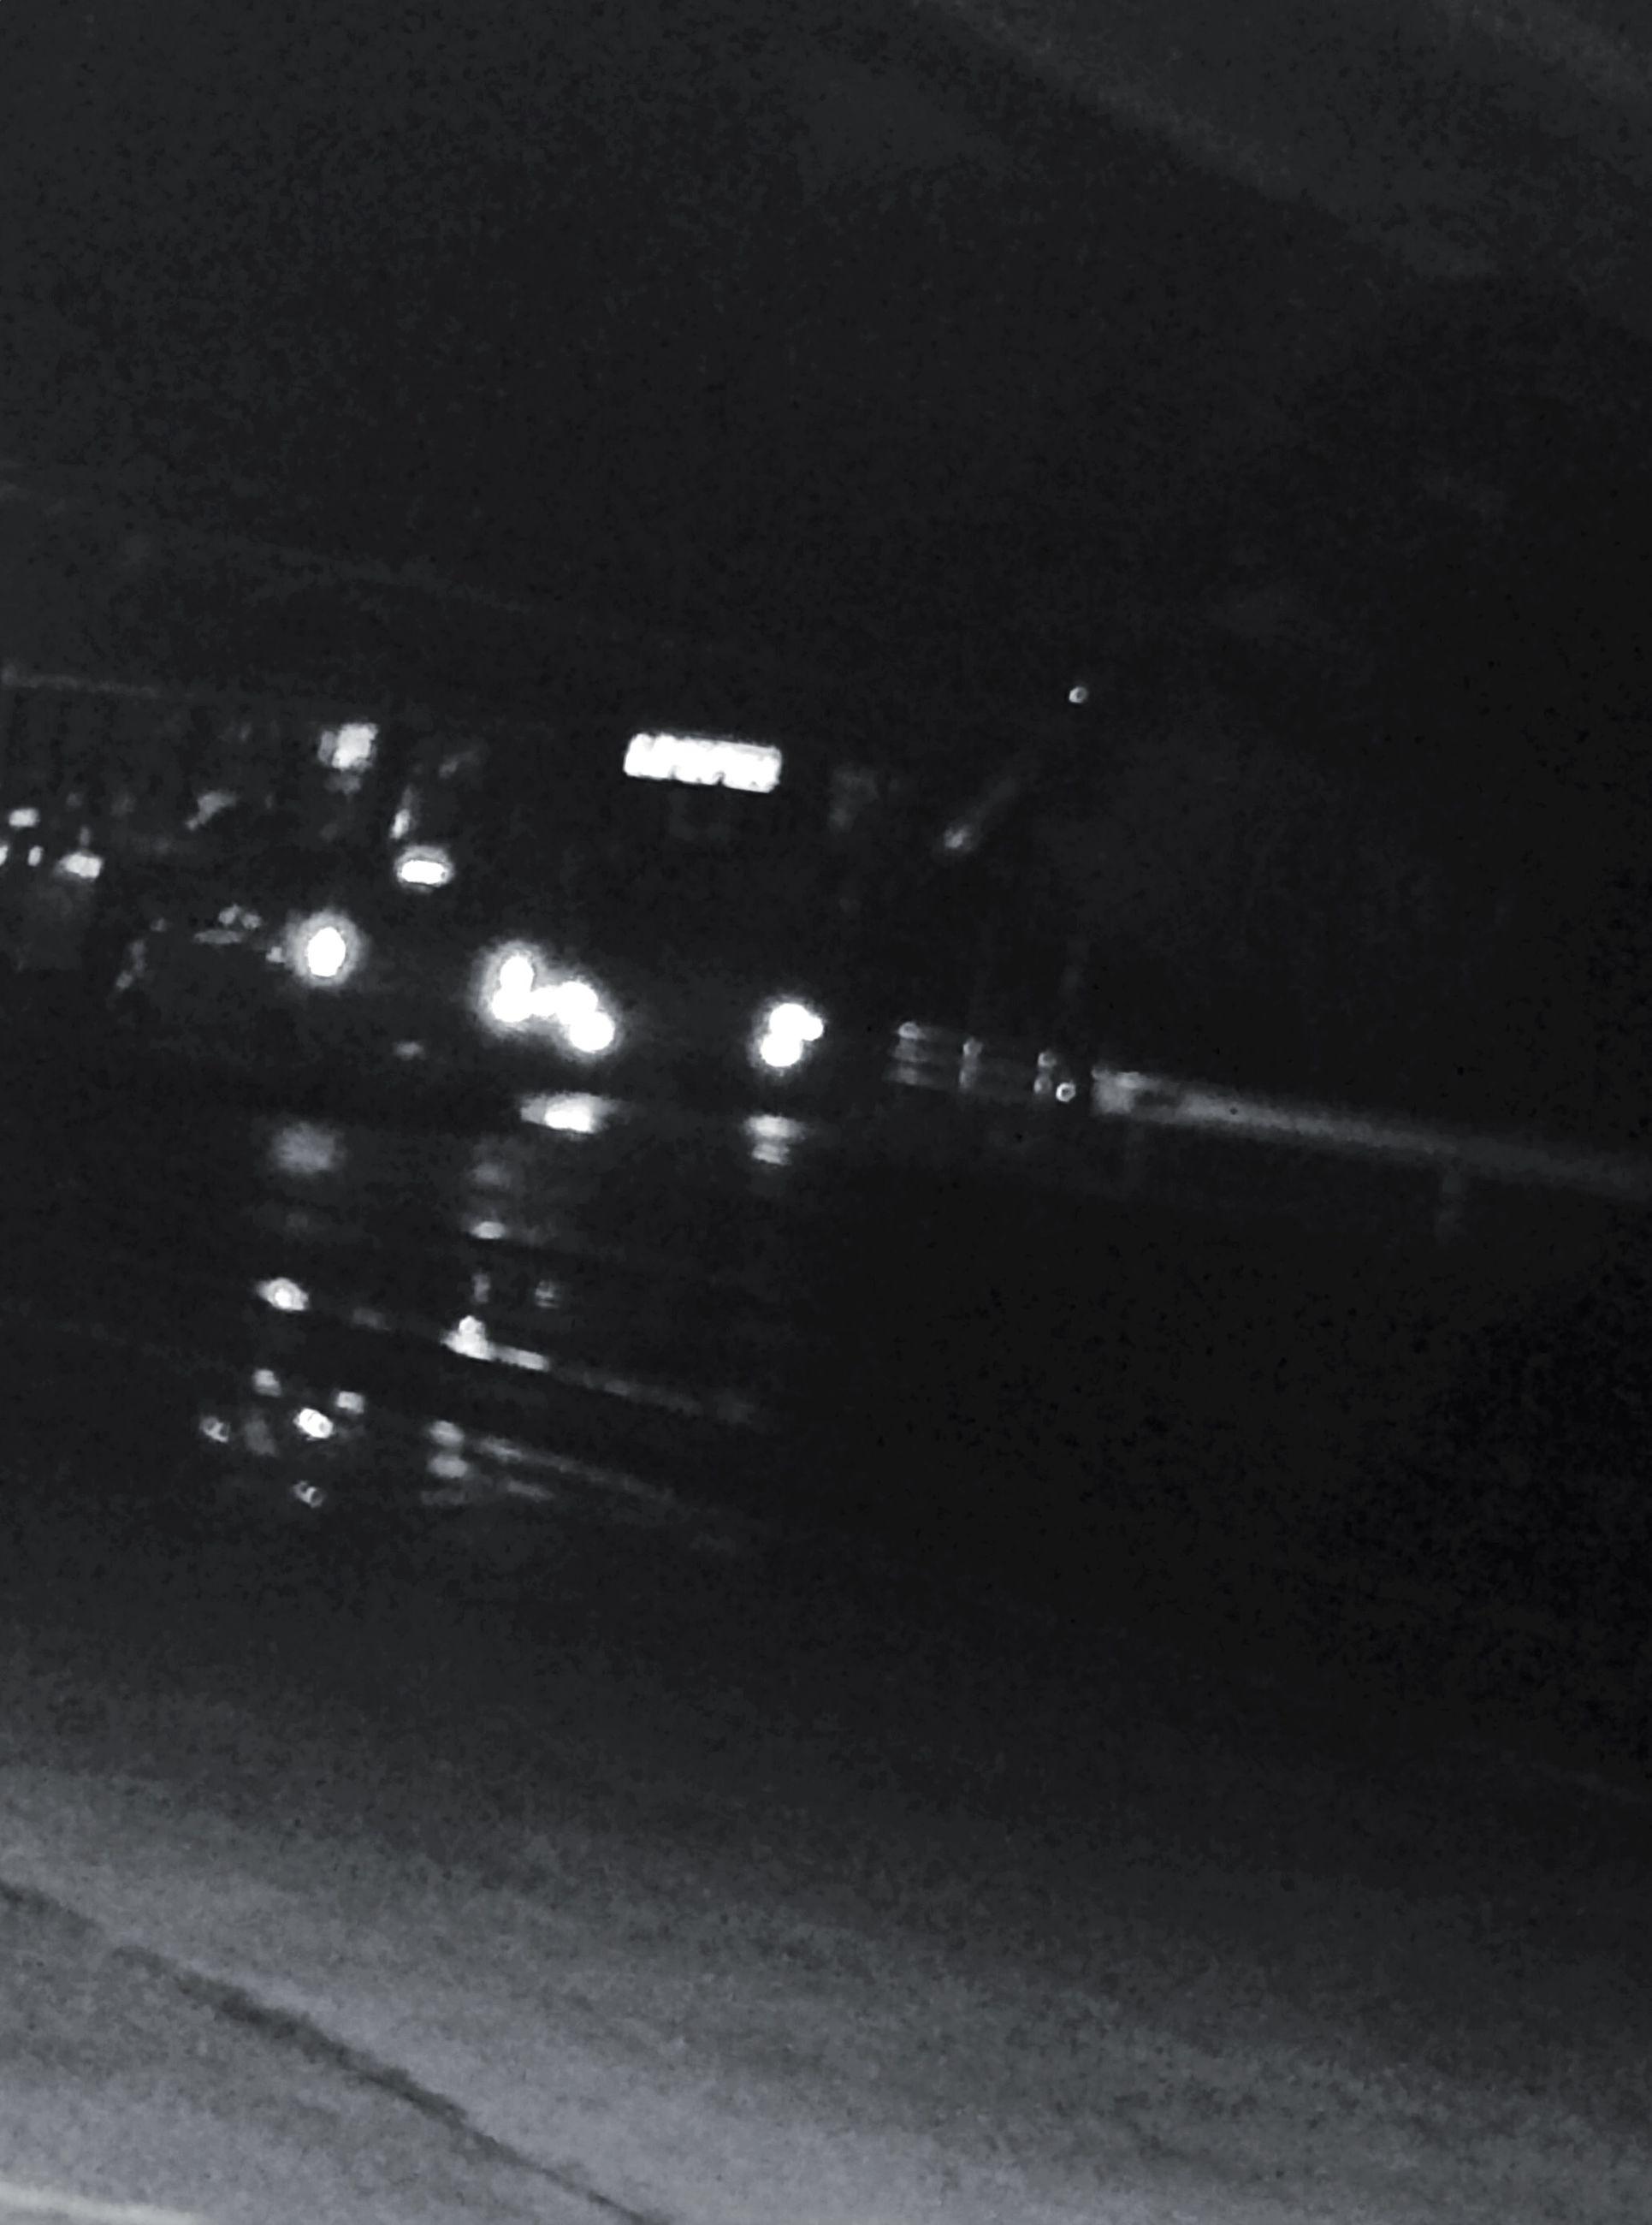 transportation, illuminated, night, mode of transport, car, road, land vehicle, street, lighting equipment, on the move, road marking, street light, travel, indoors, no people, motion, high angle view, rain, city